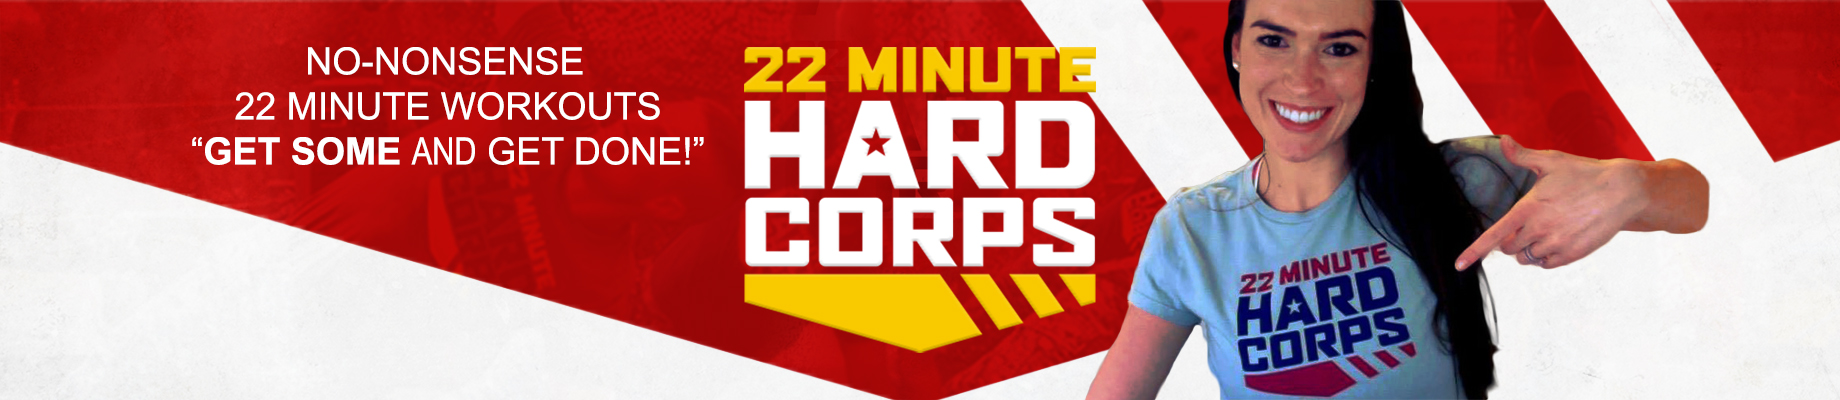 22 Minute Hard Corps | Elizabeth Hartke | Drop the Cookie